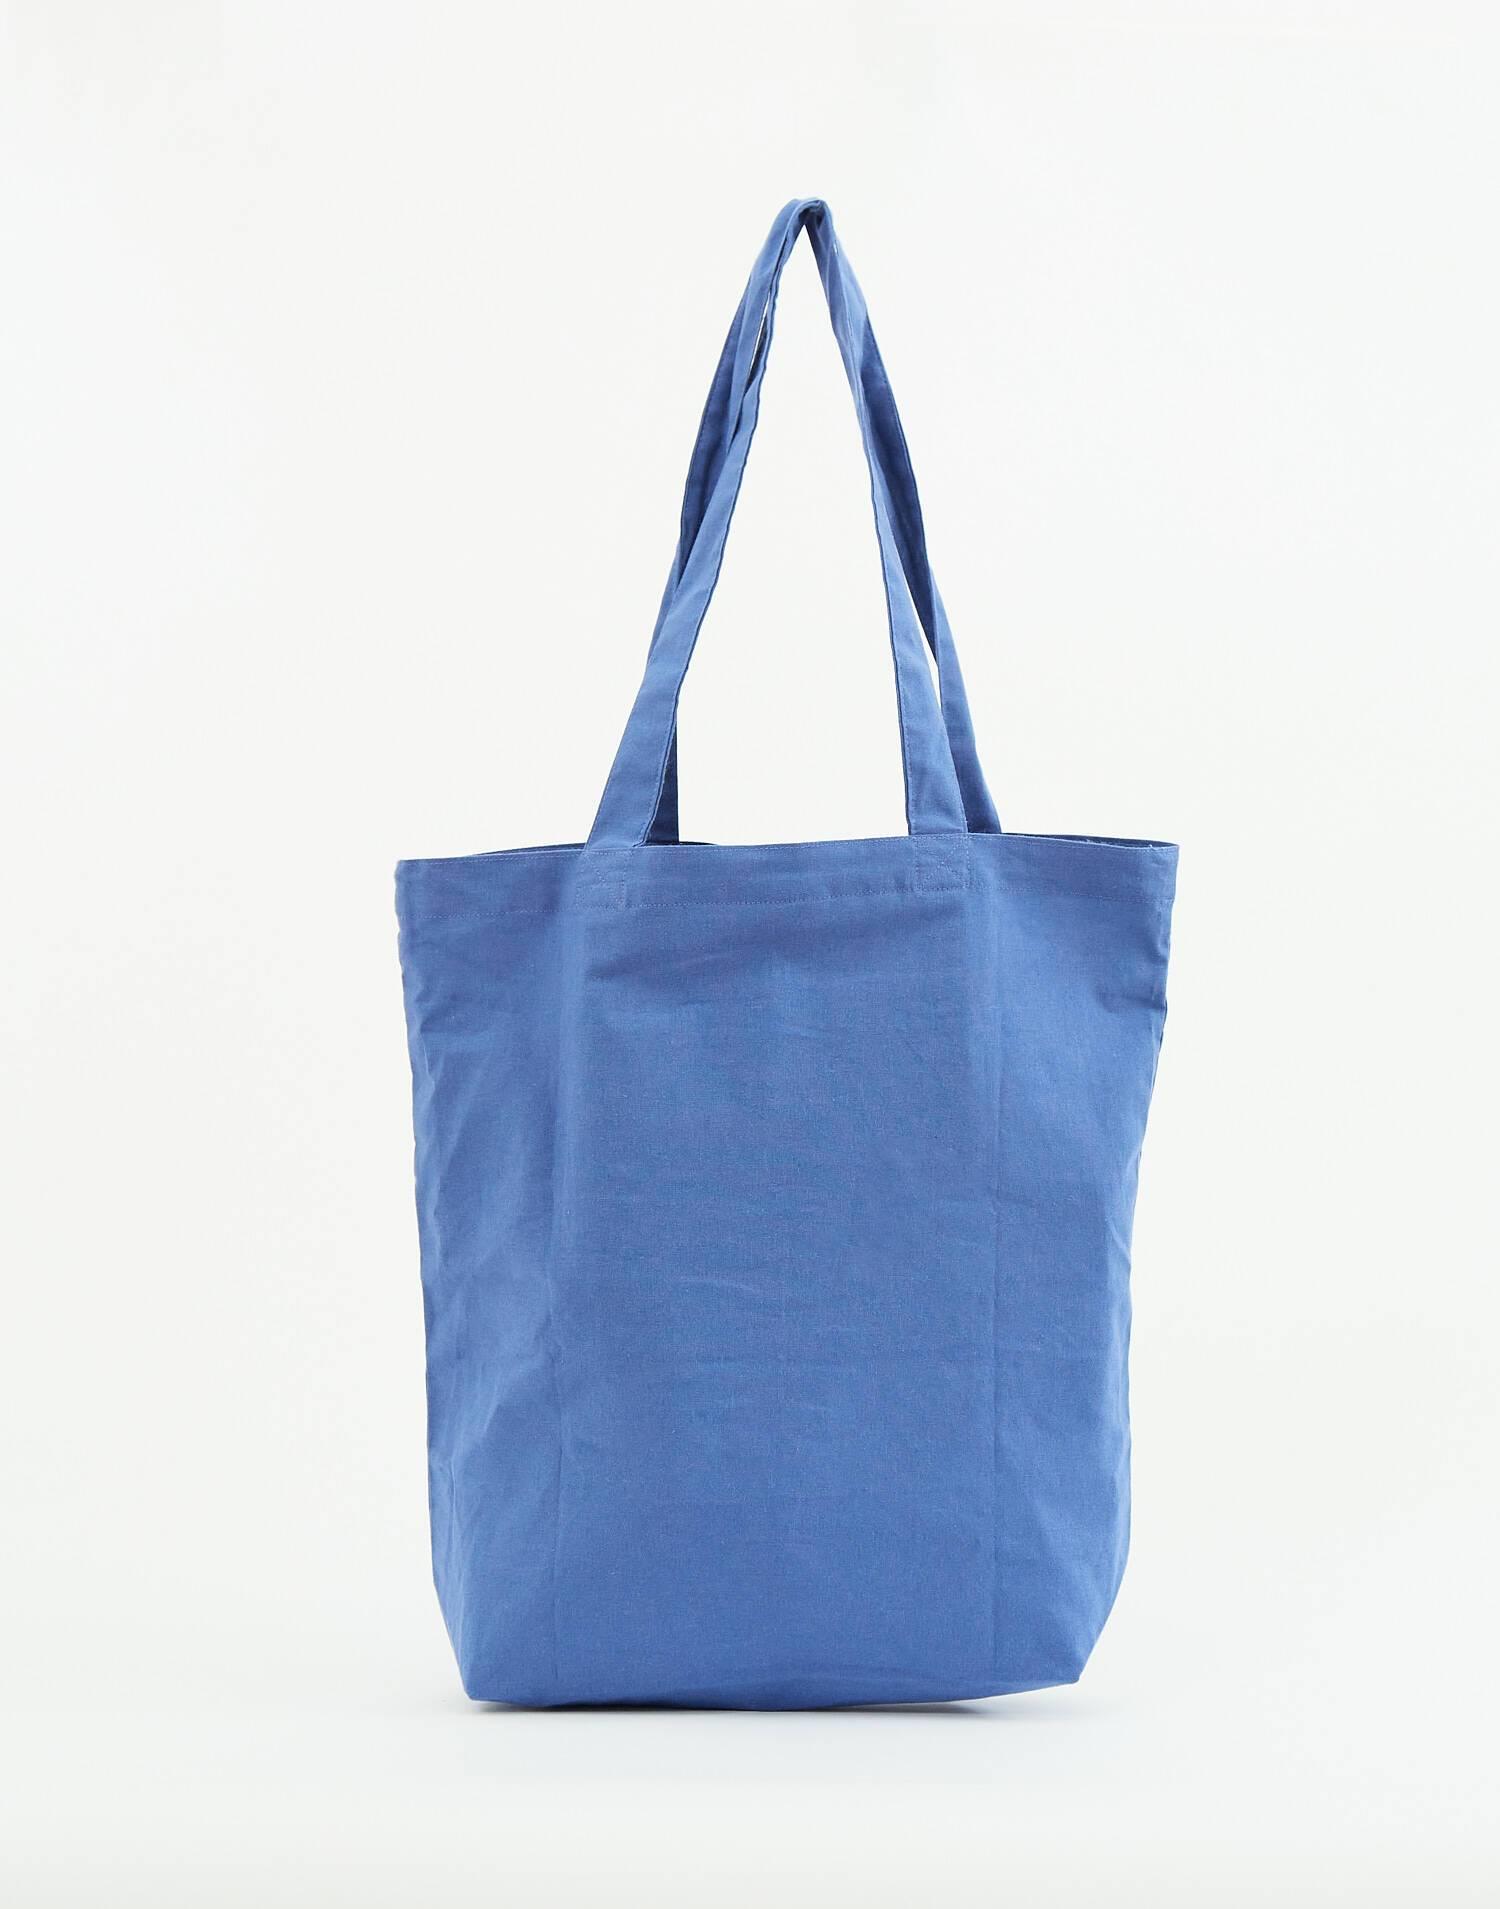 Foldaway cotton tote bag